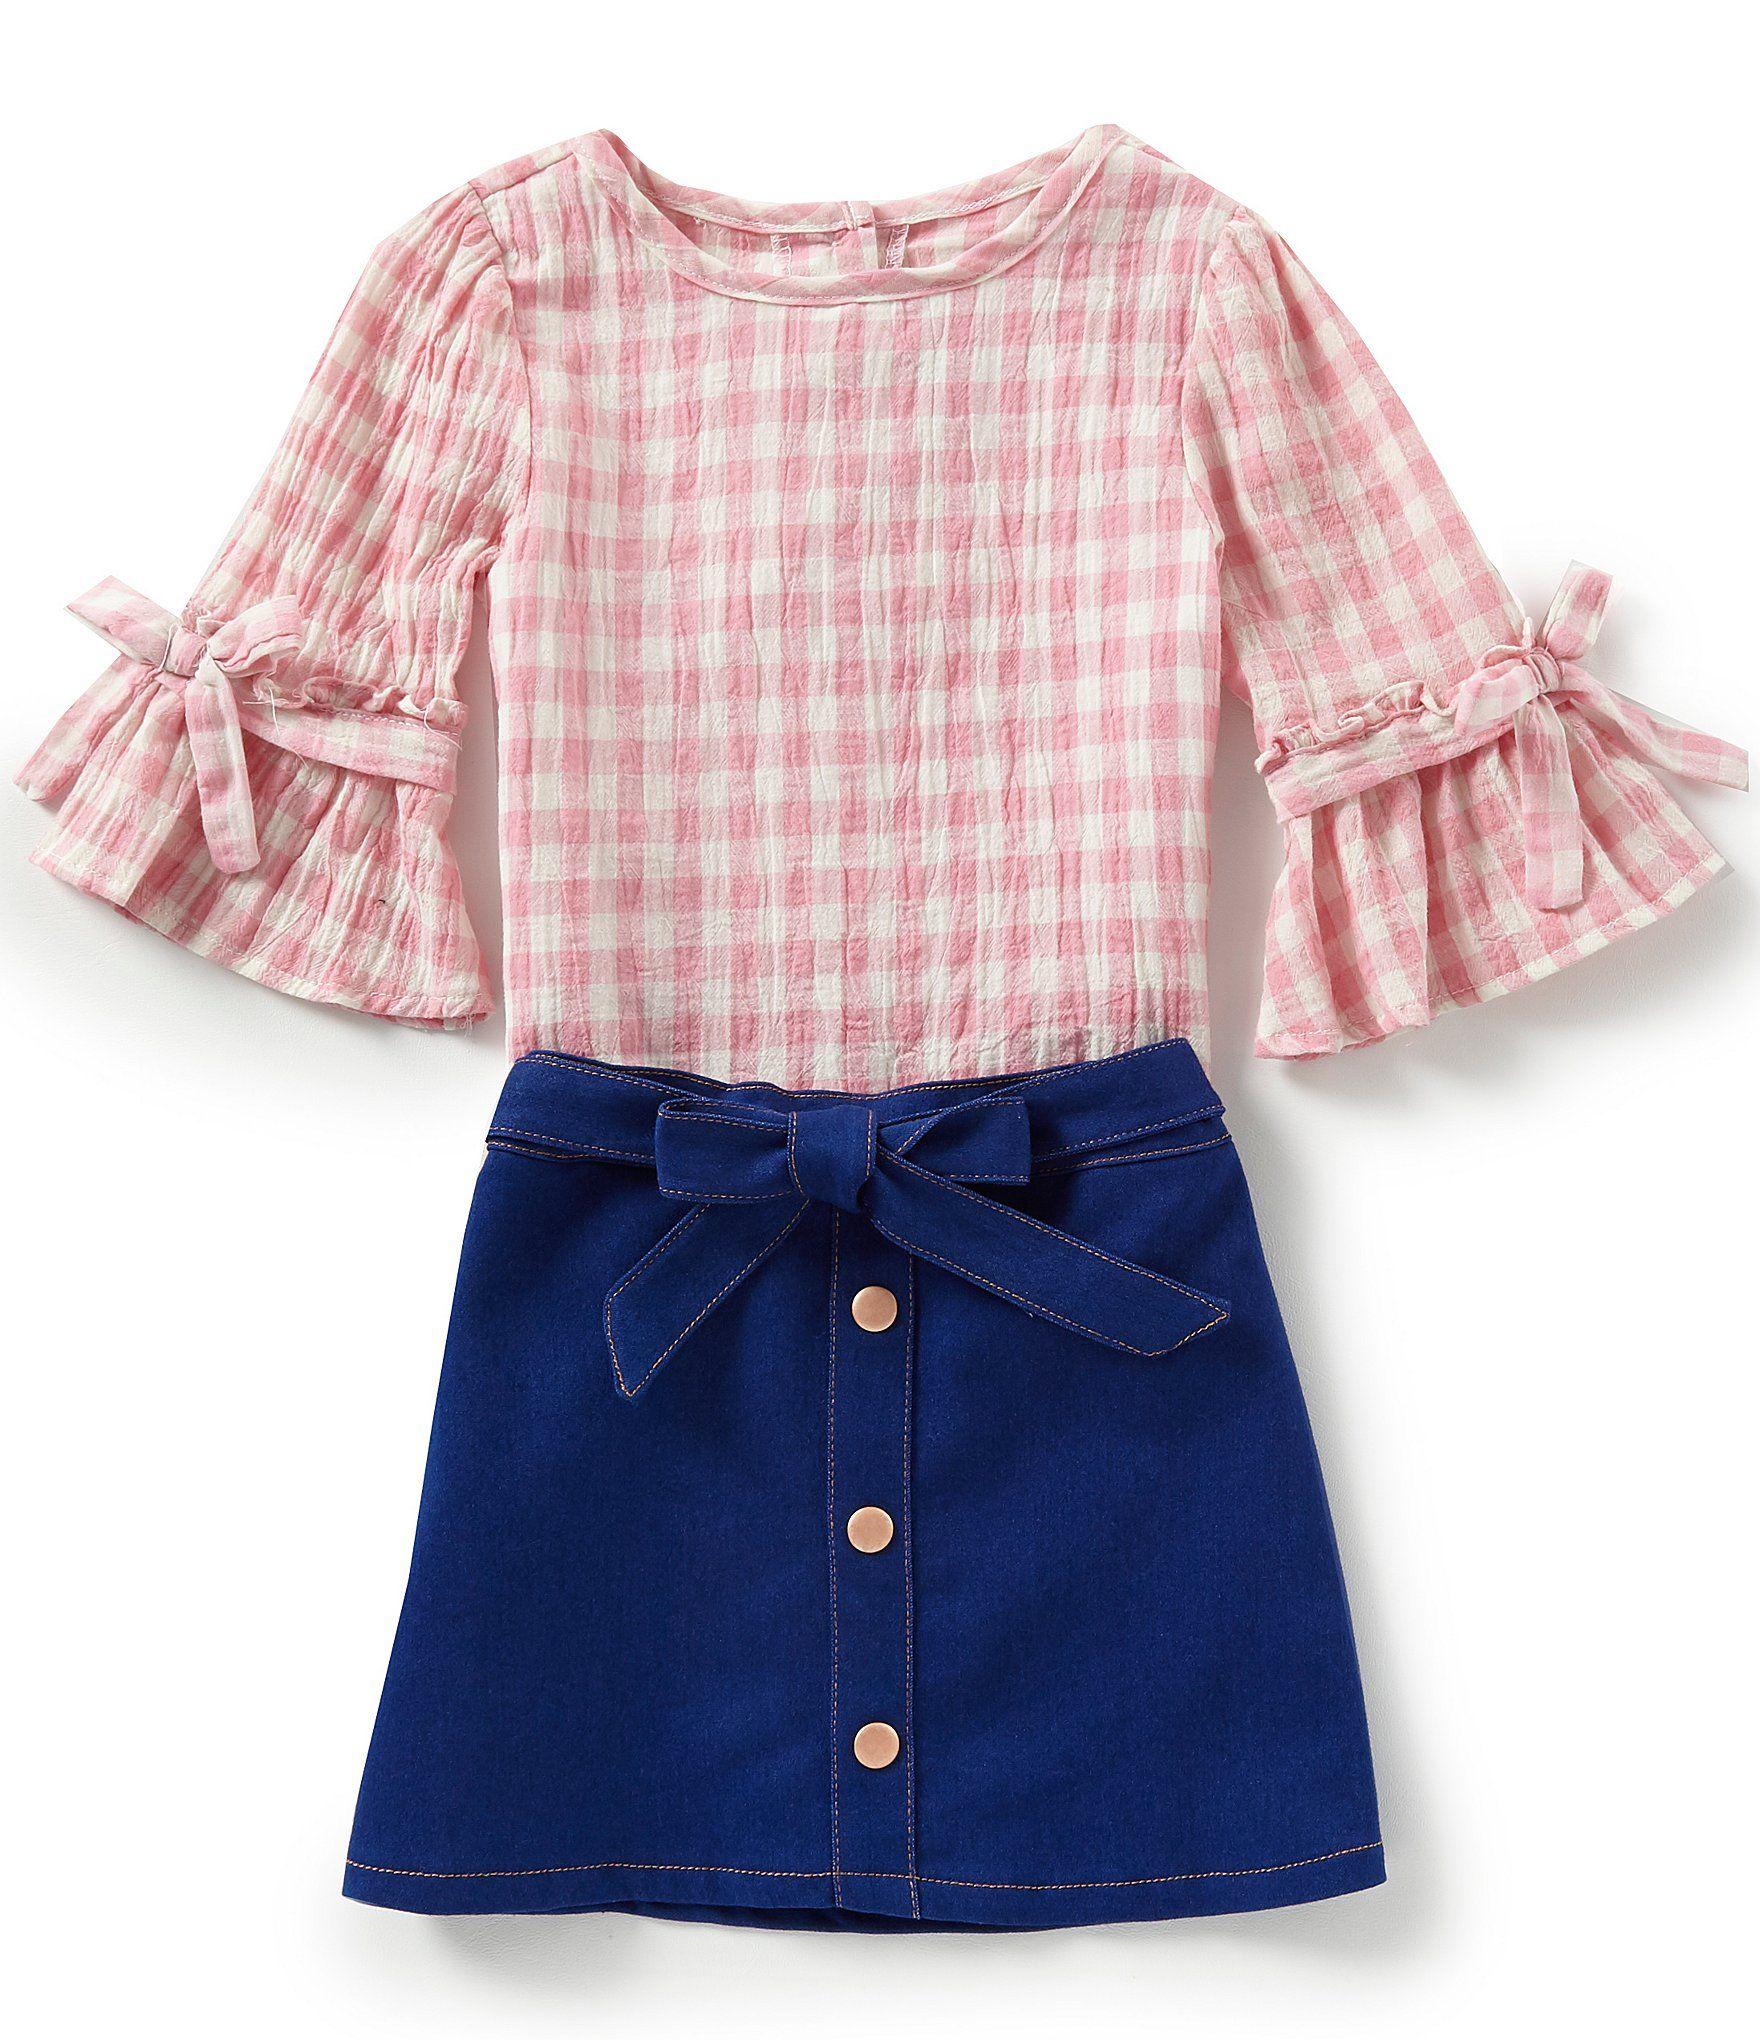 783b4c160c Jean Skirts At Dillards